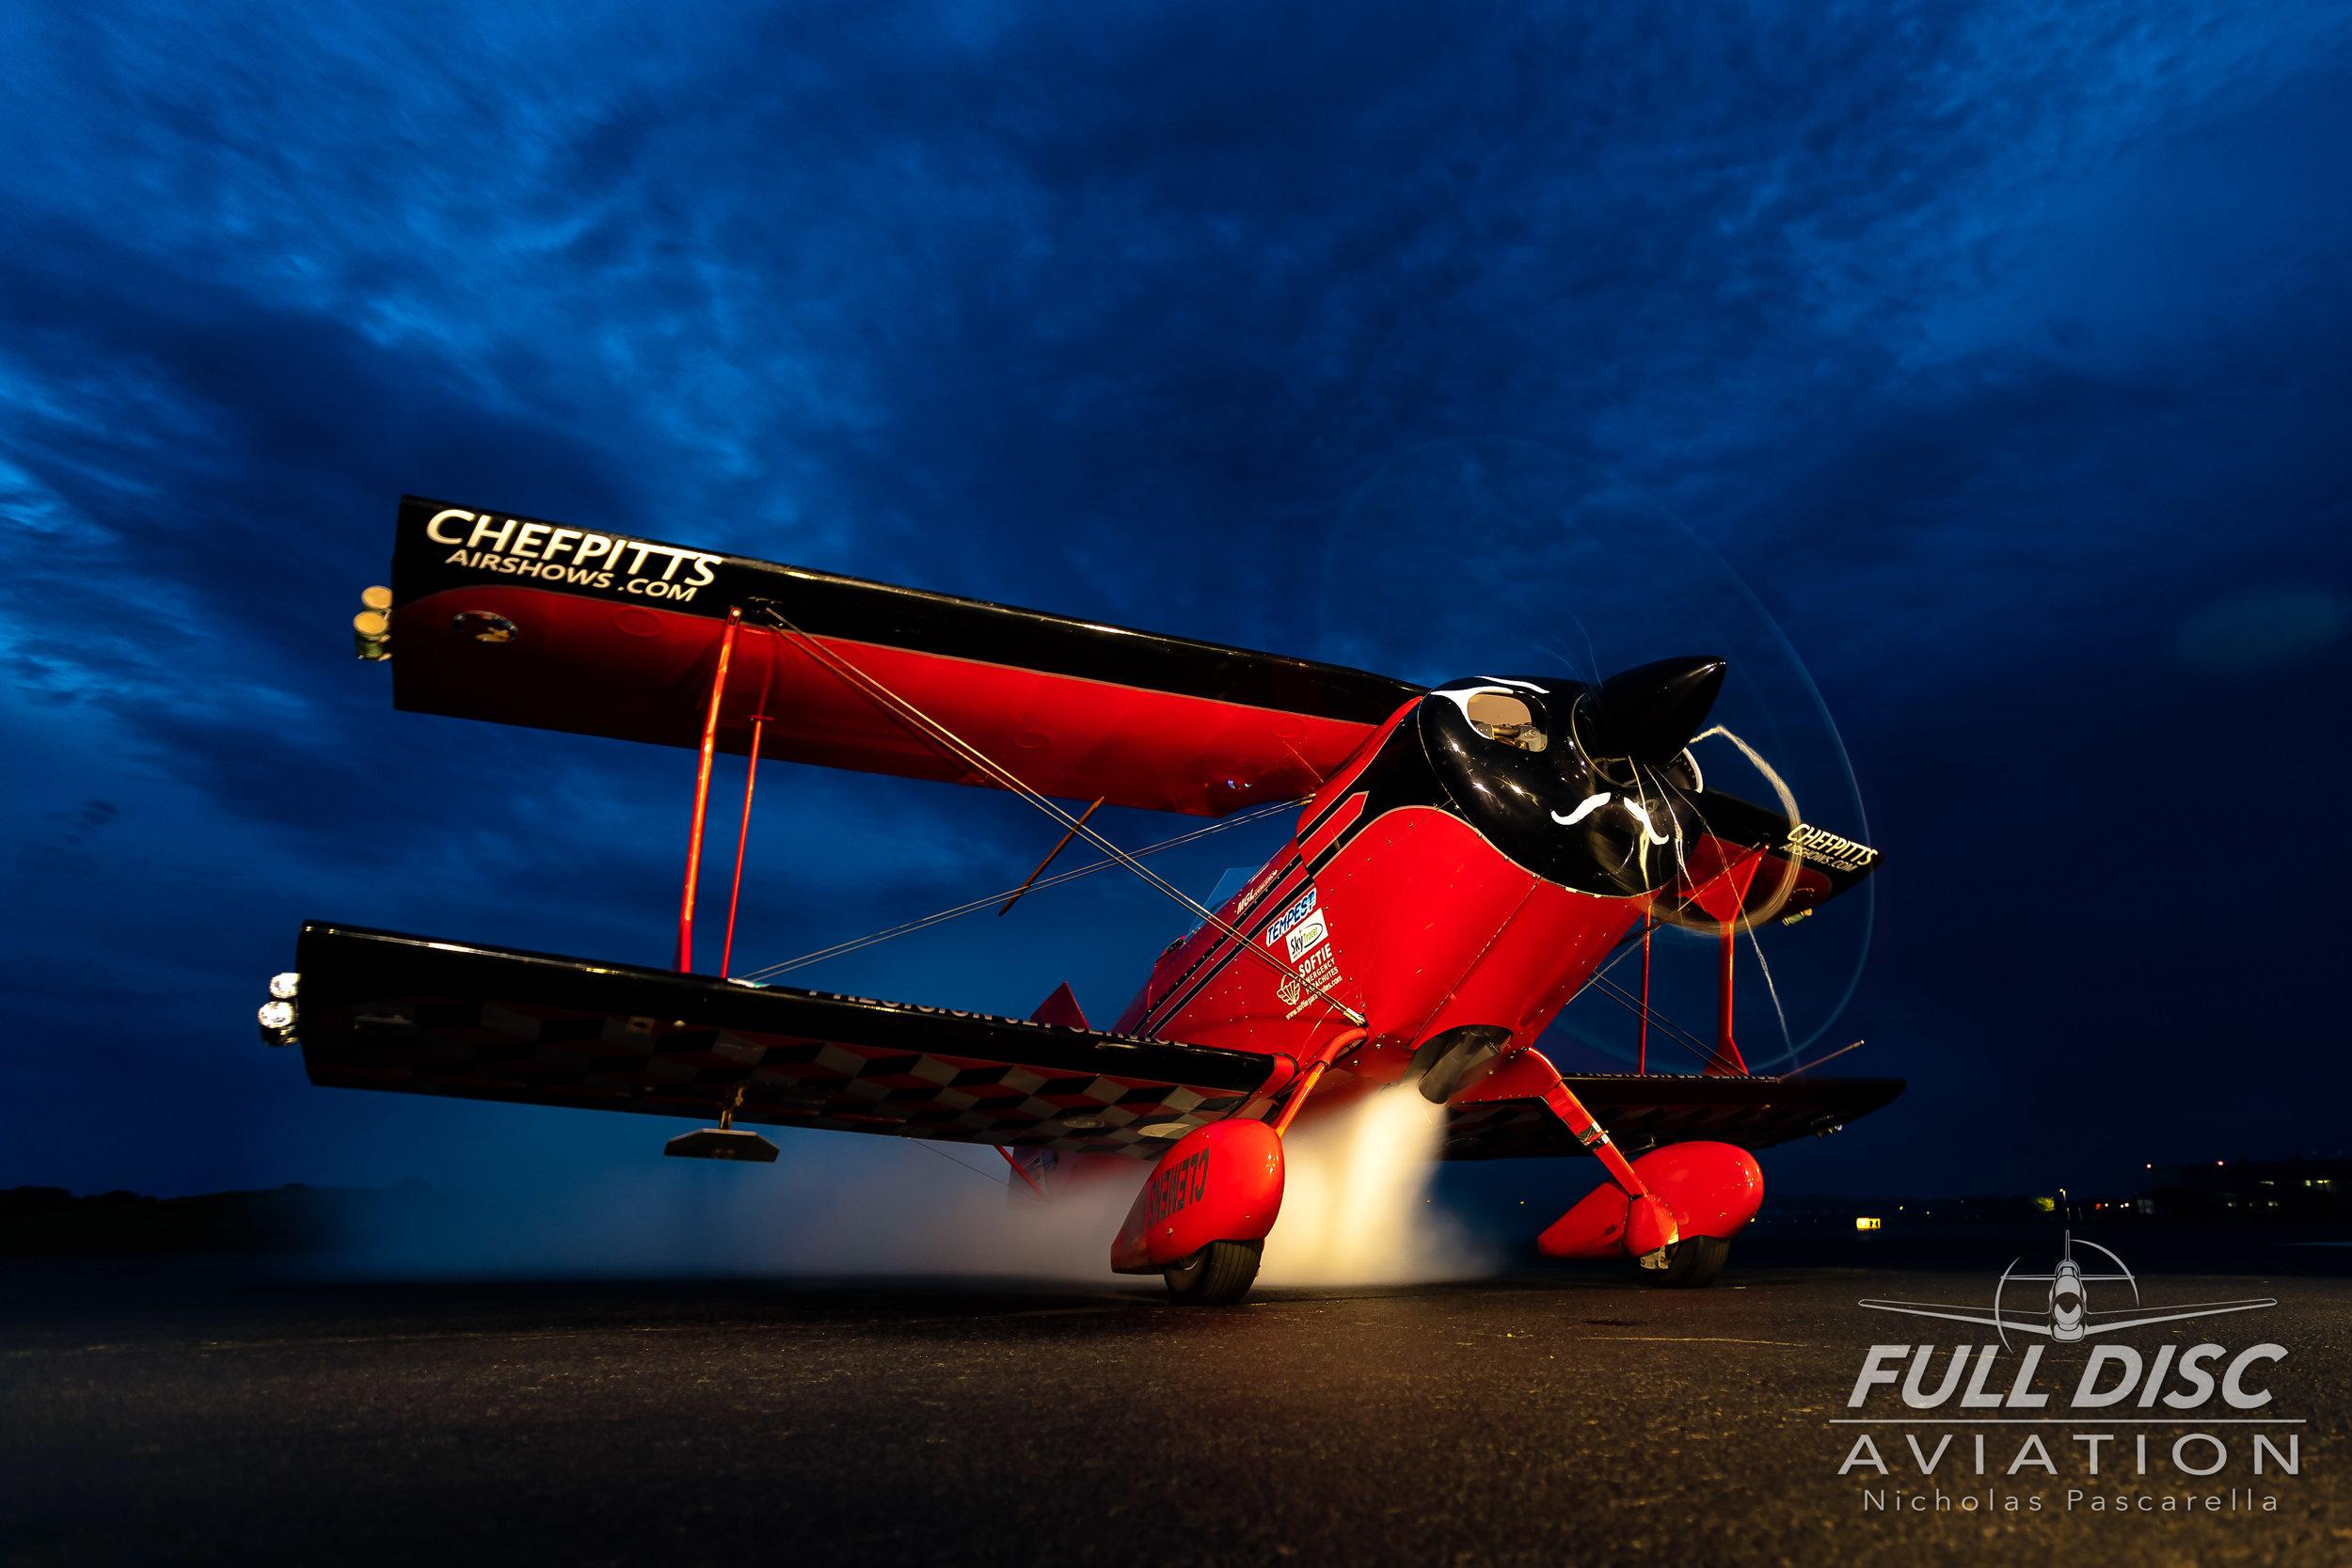 chefpitts_nightsmoke_rjgritter_decathalon_pilot_portrait_nightshoot__aviation__nickpascarella_nicholaspascarella_fulldiscaviation_leasewebmanassasairshow.jpg.jpg